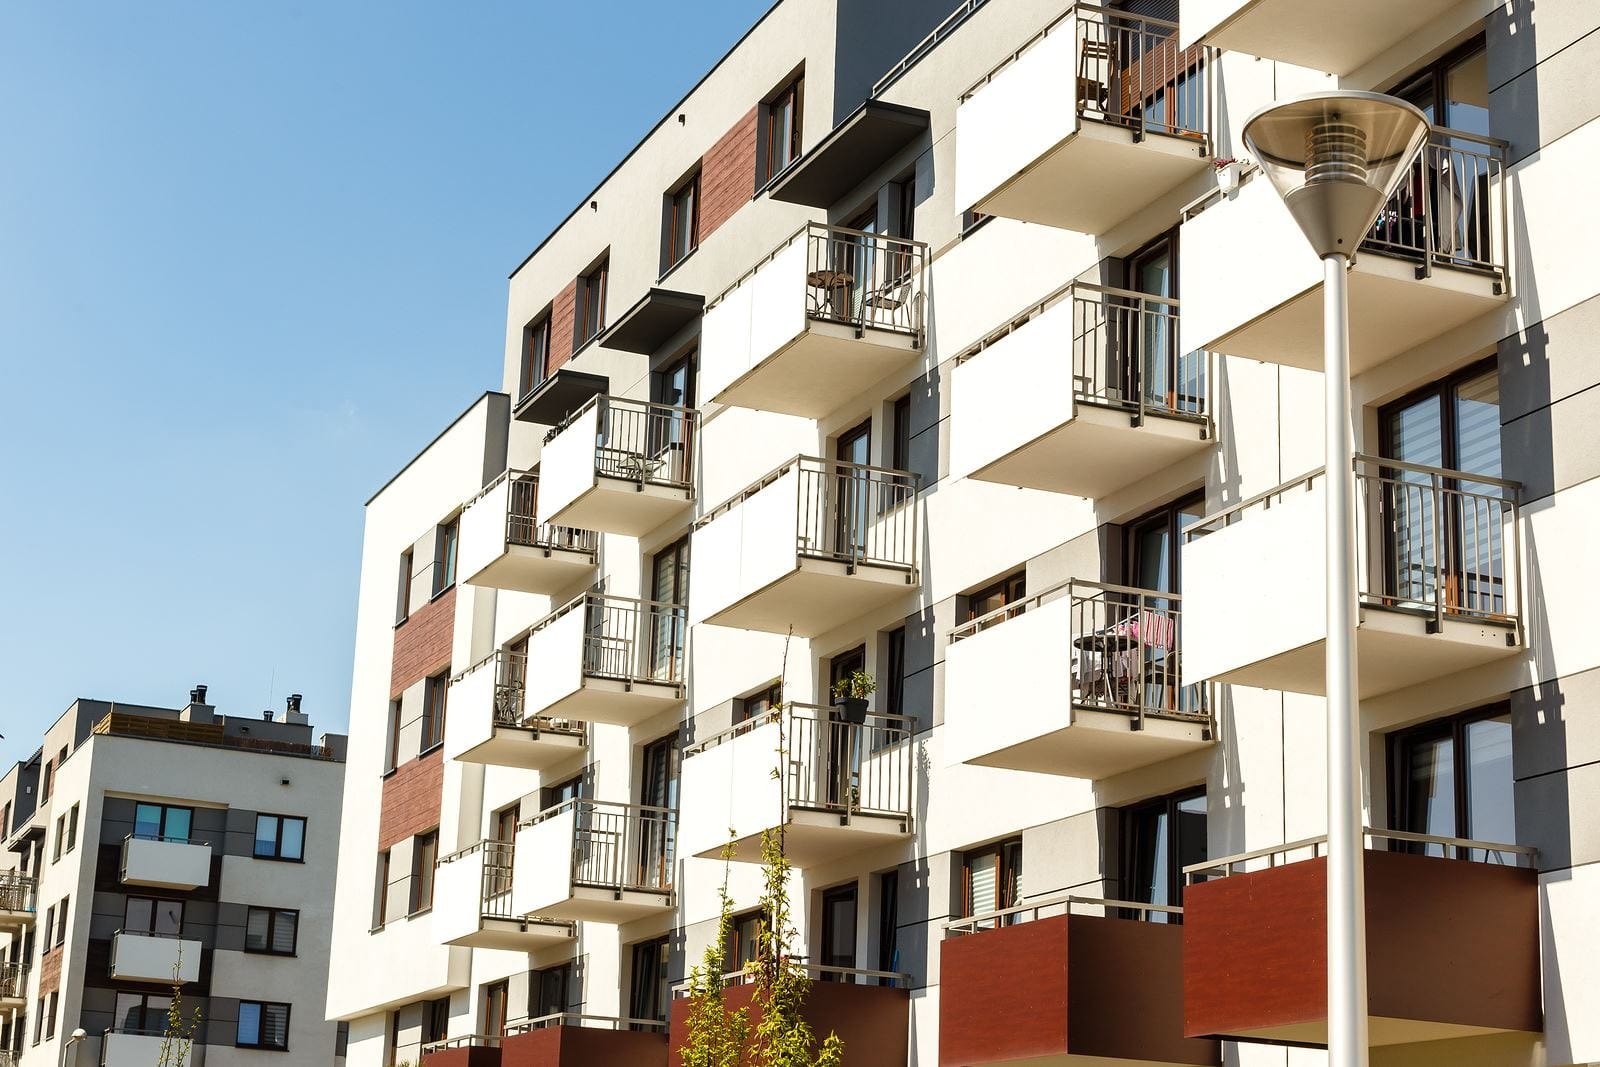 Apartment building investing blog investors gordon phillips forexworld